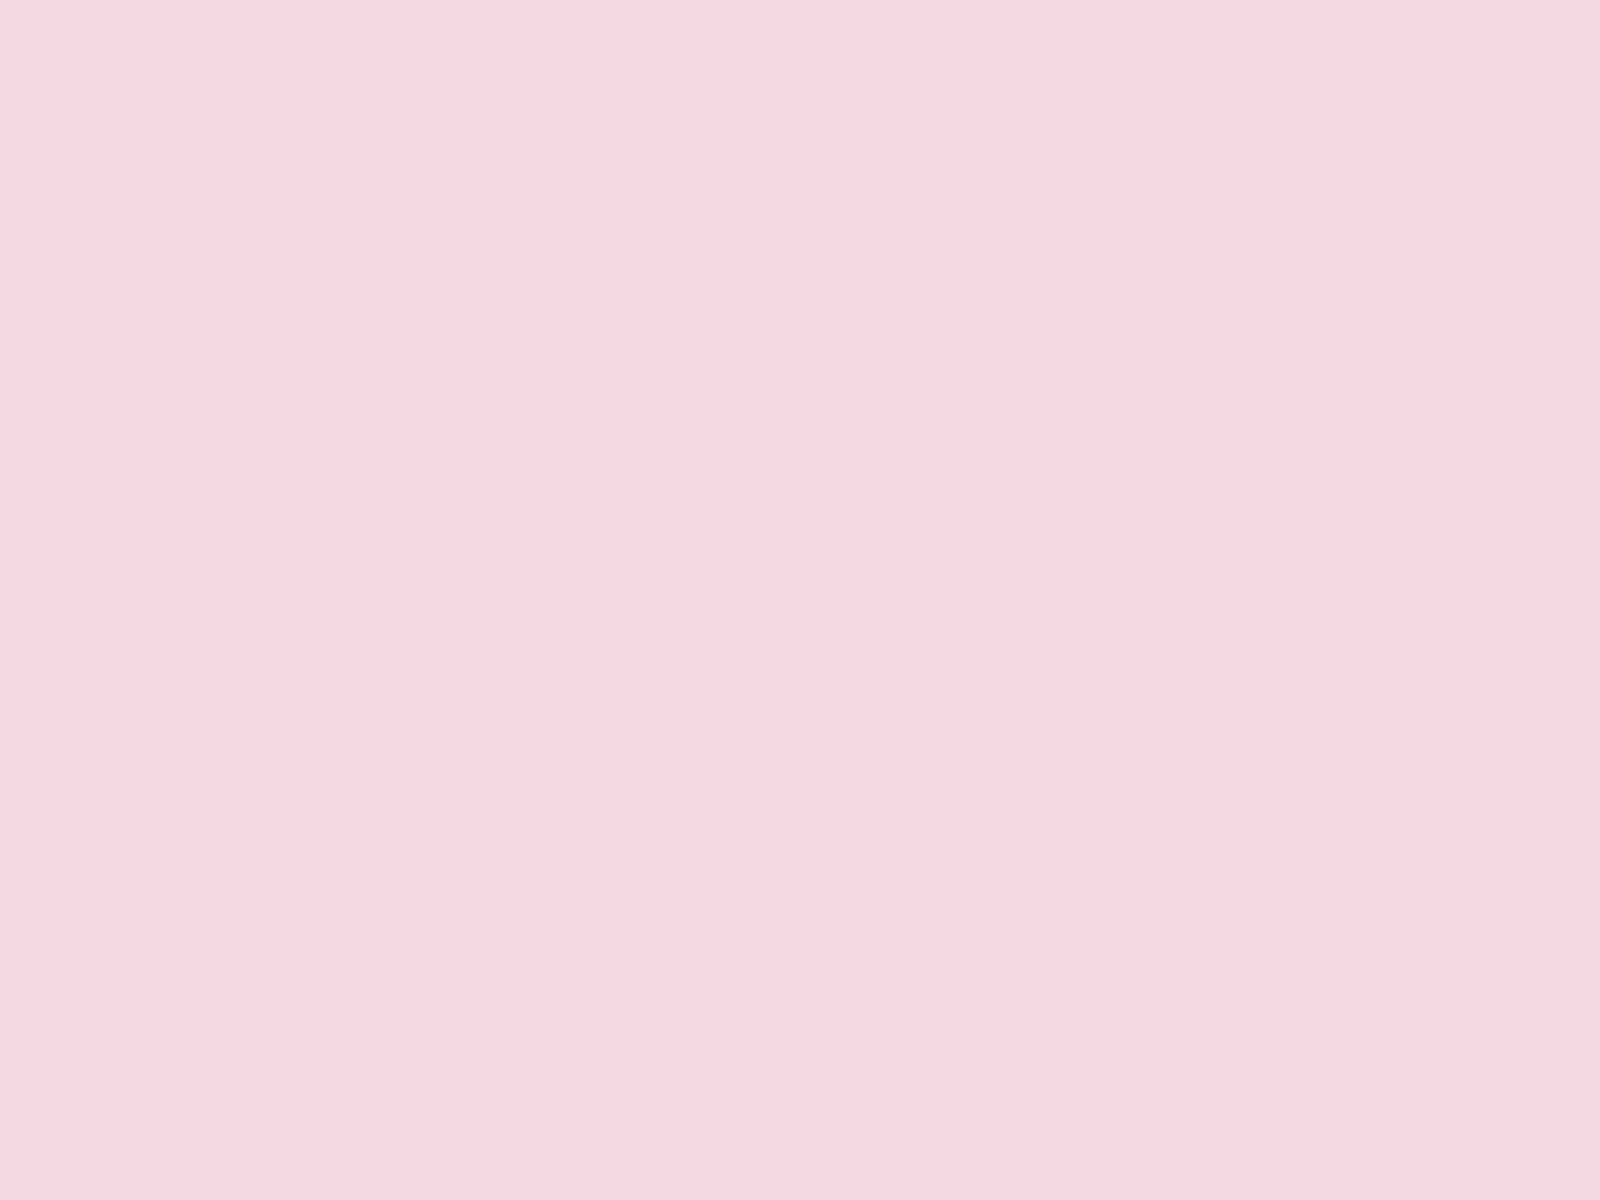 1600x1200 Vanilla Ice Solid Color Background